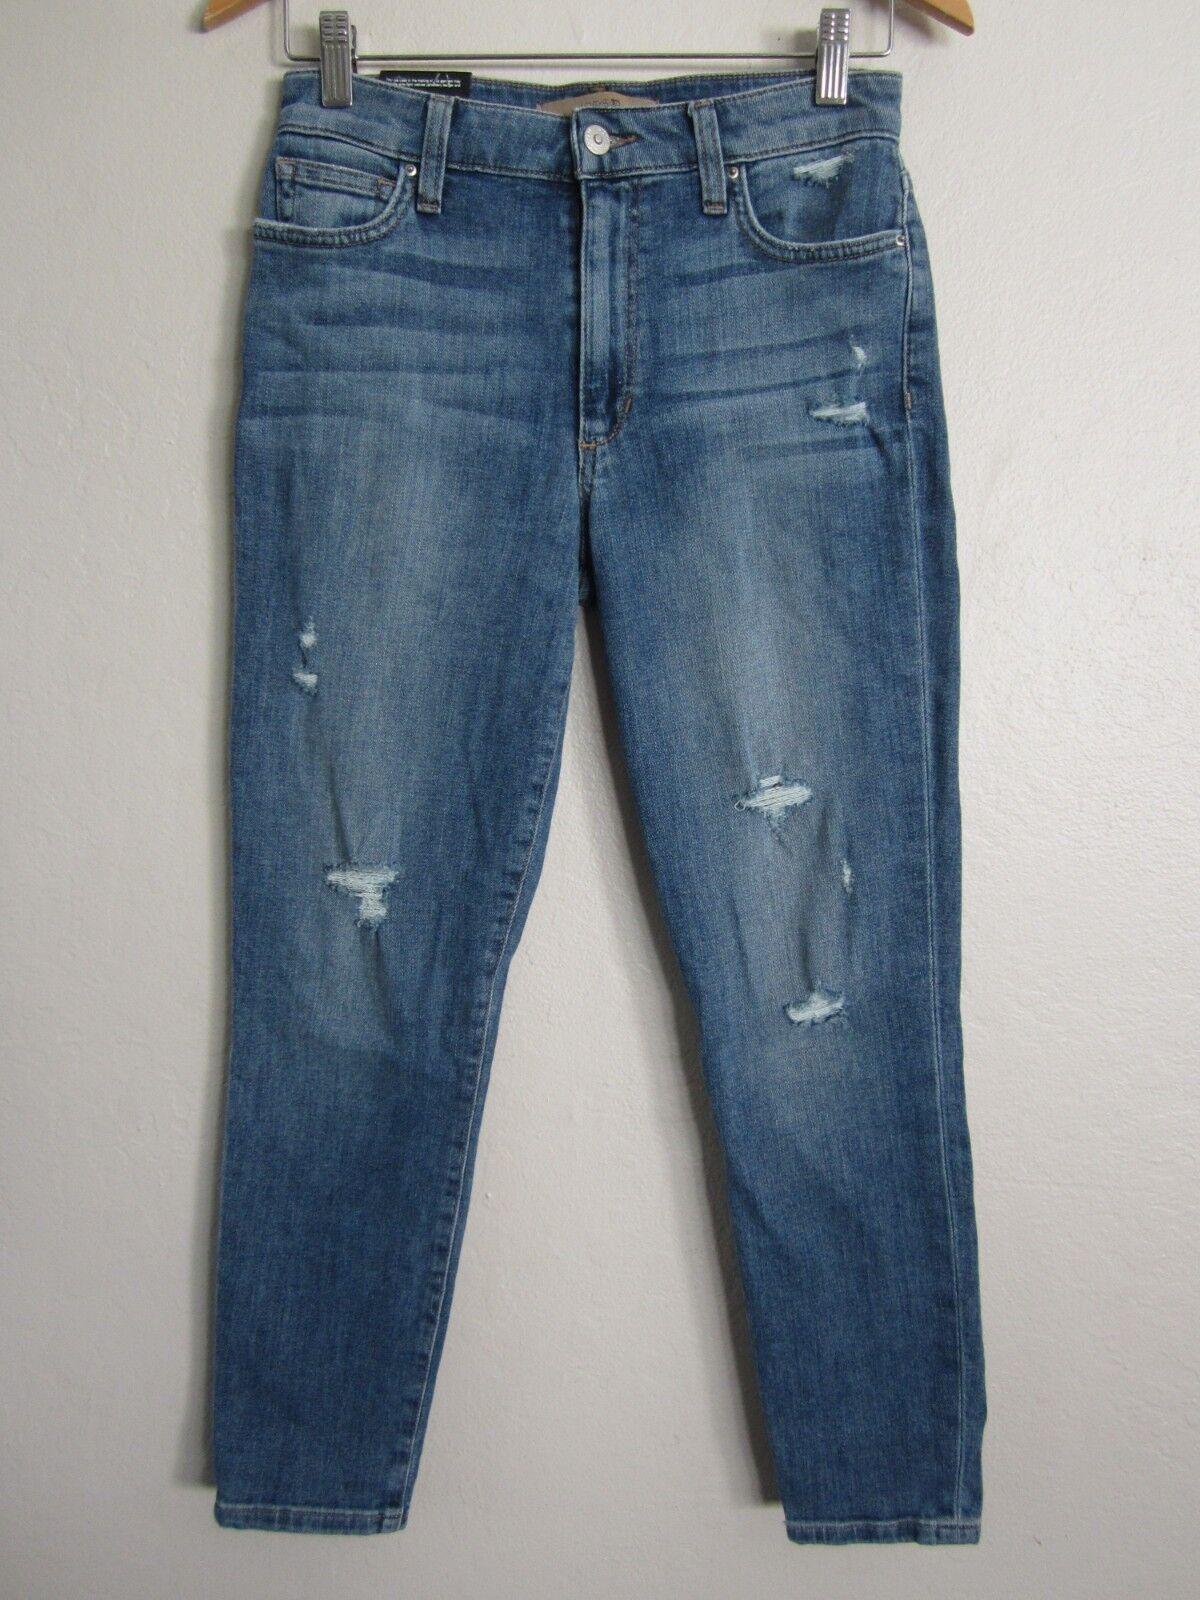 Paige High Rise Crop Distressed Jeans Fatima 26 x 26 NWT